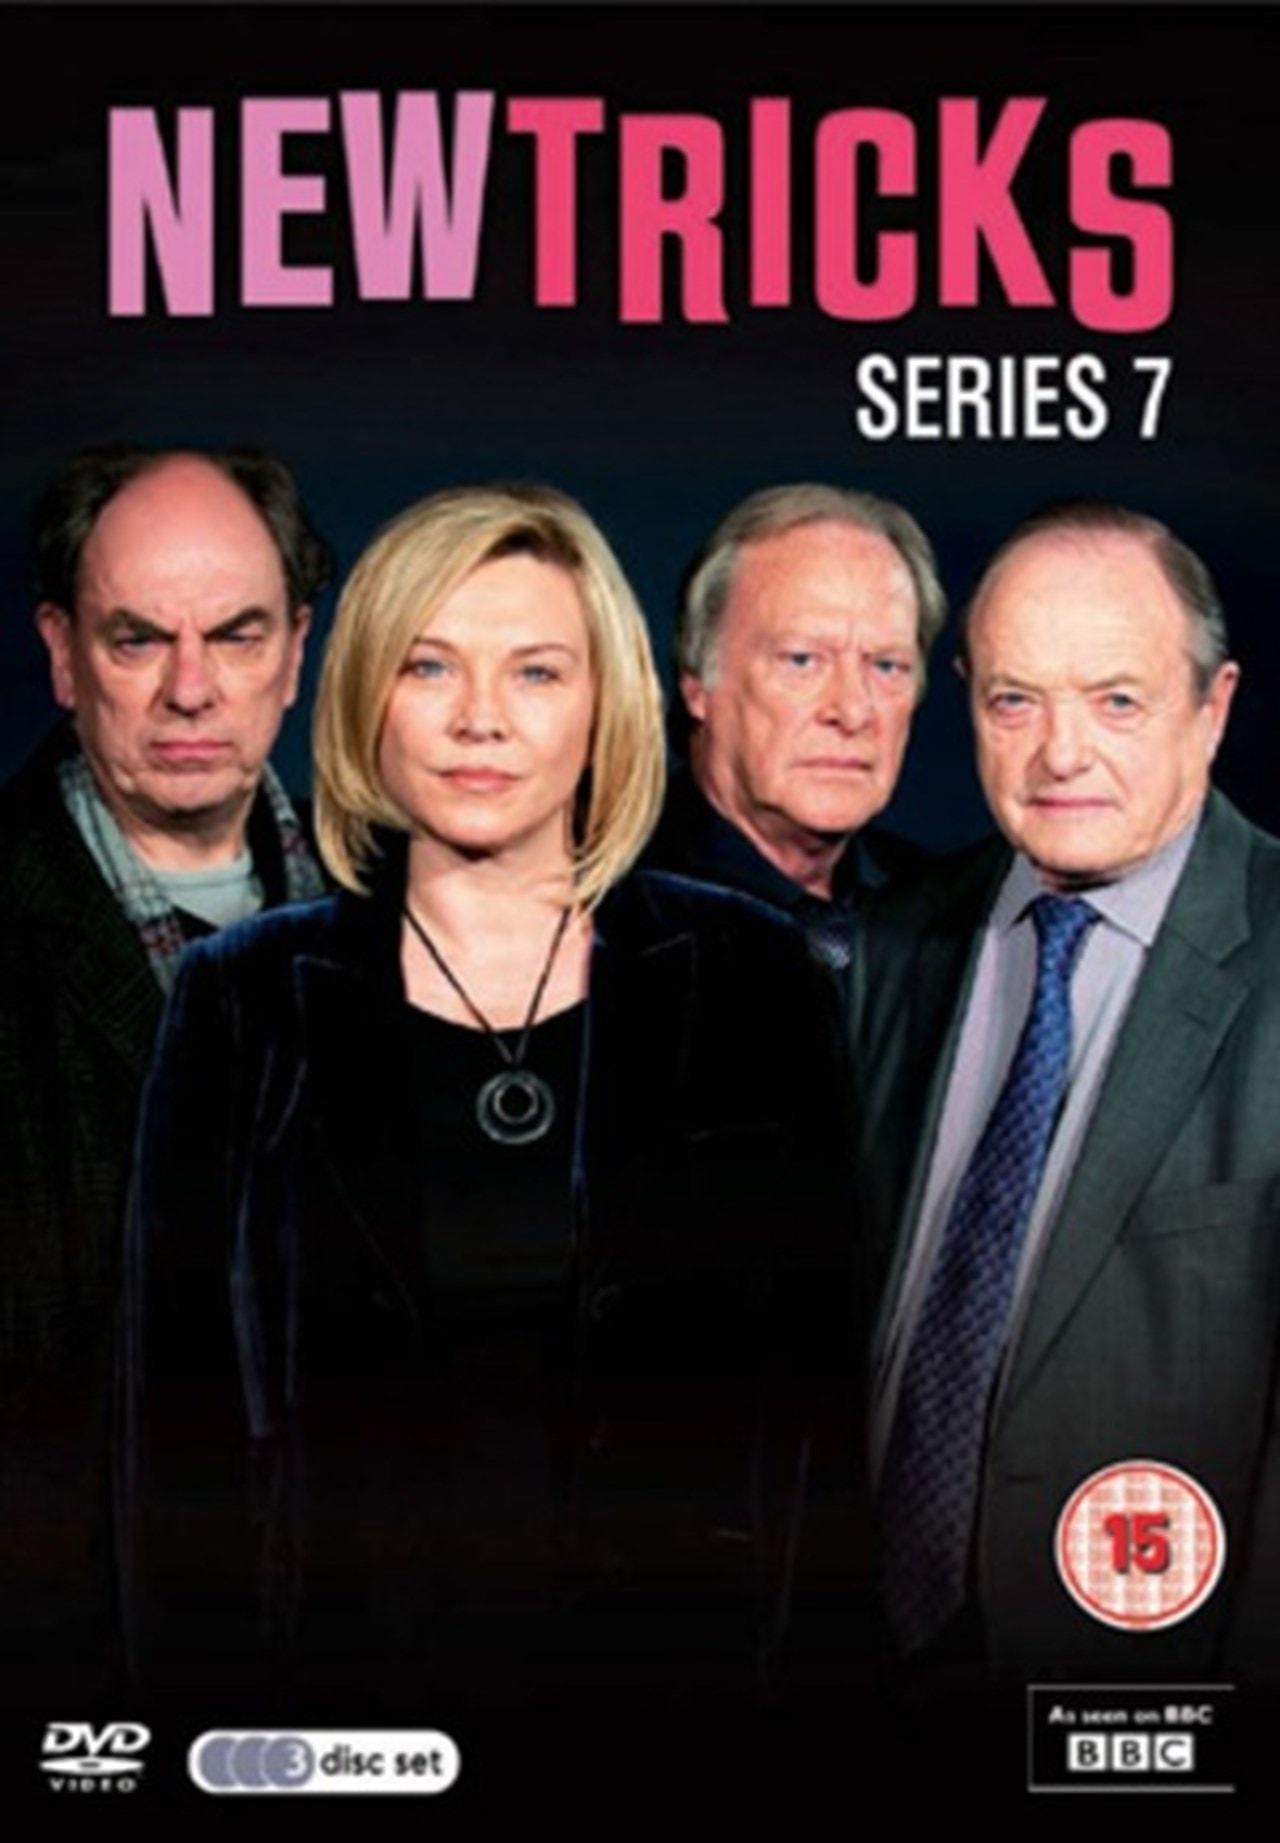 New Tricks: Series 7 - 1